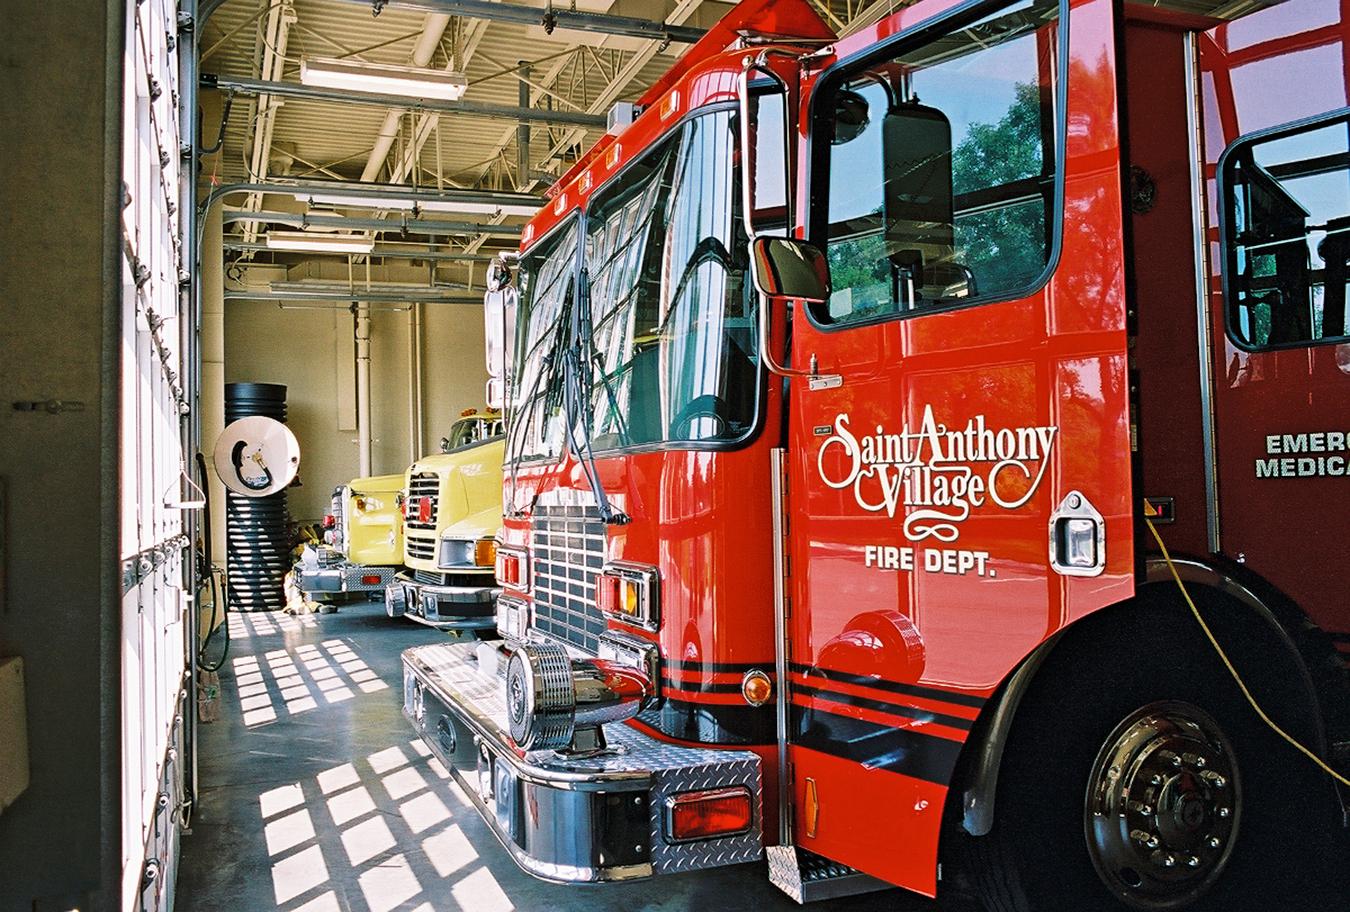 _Oertel- St. Anthony Fire 3.jpg